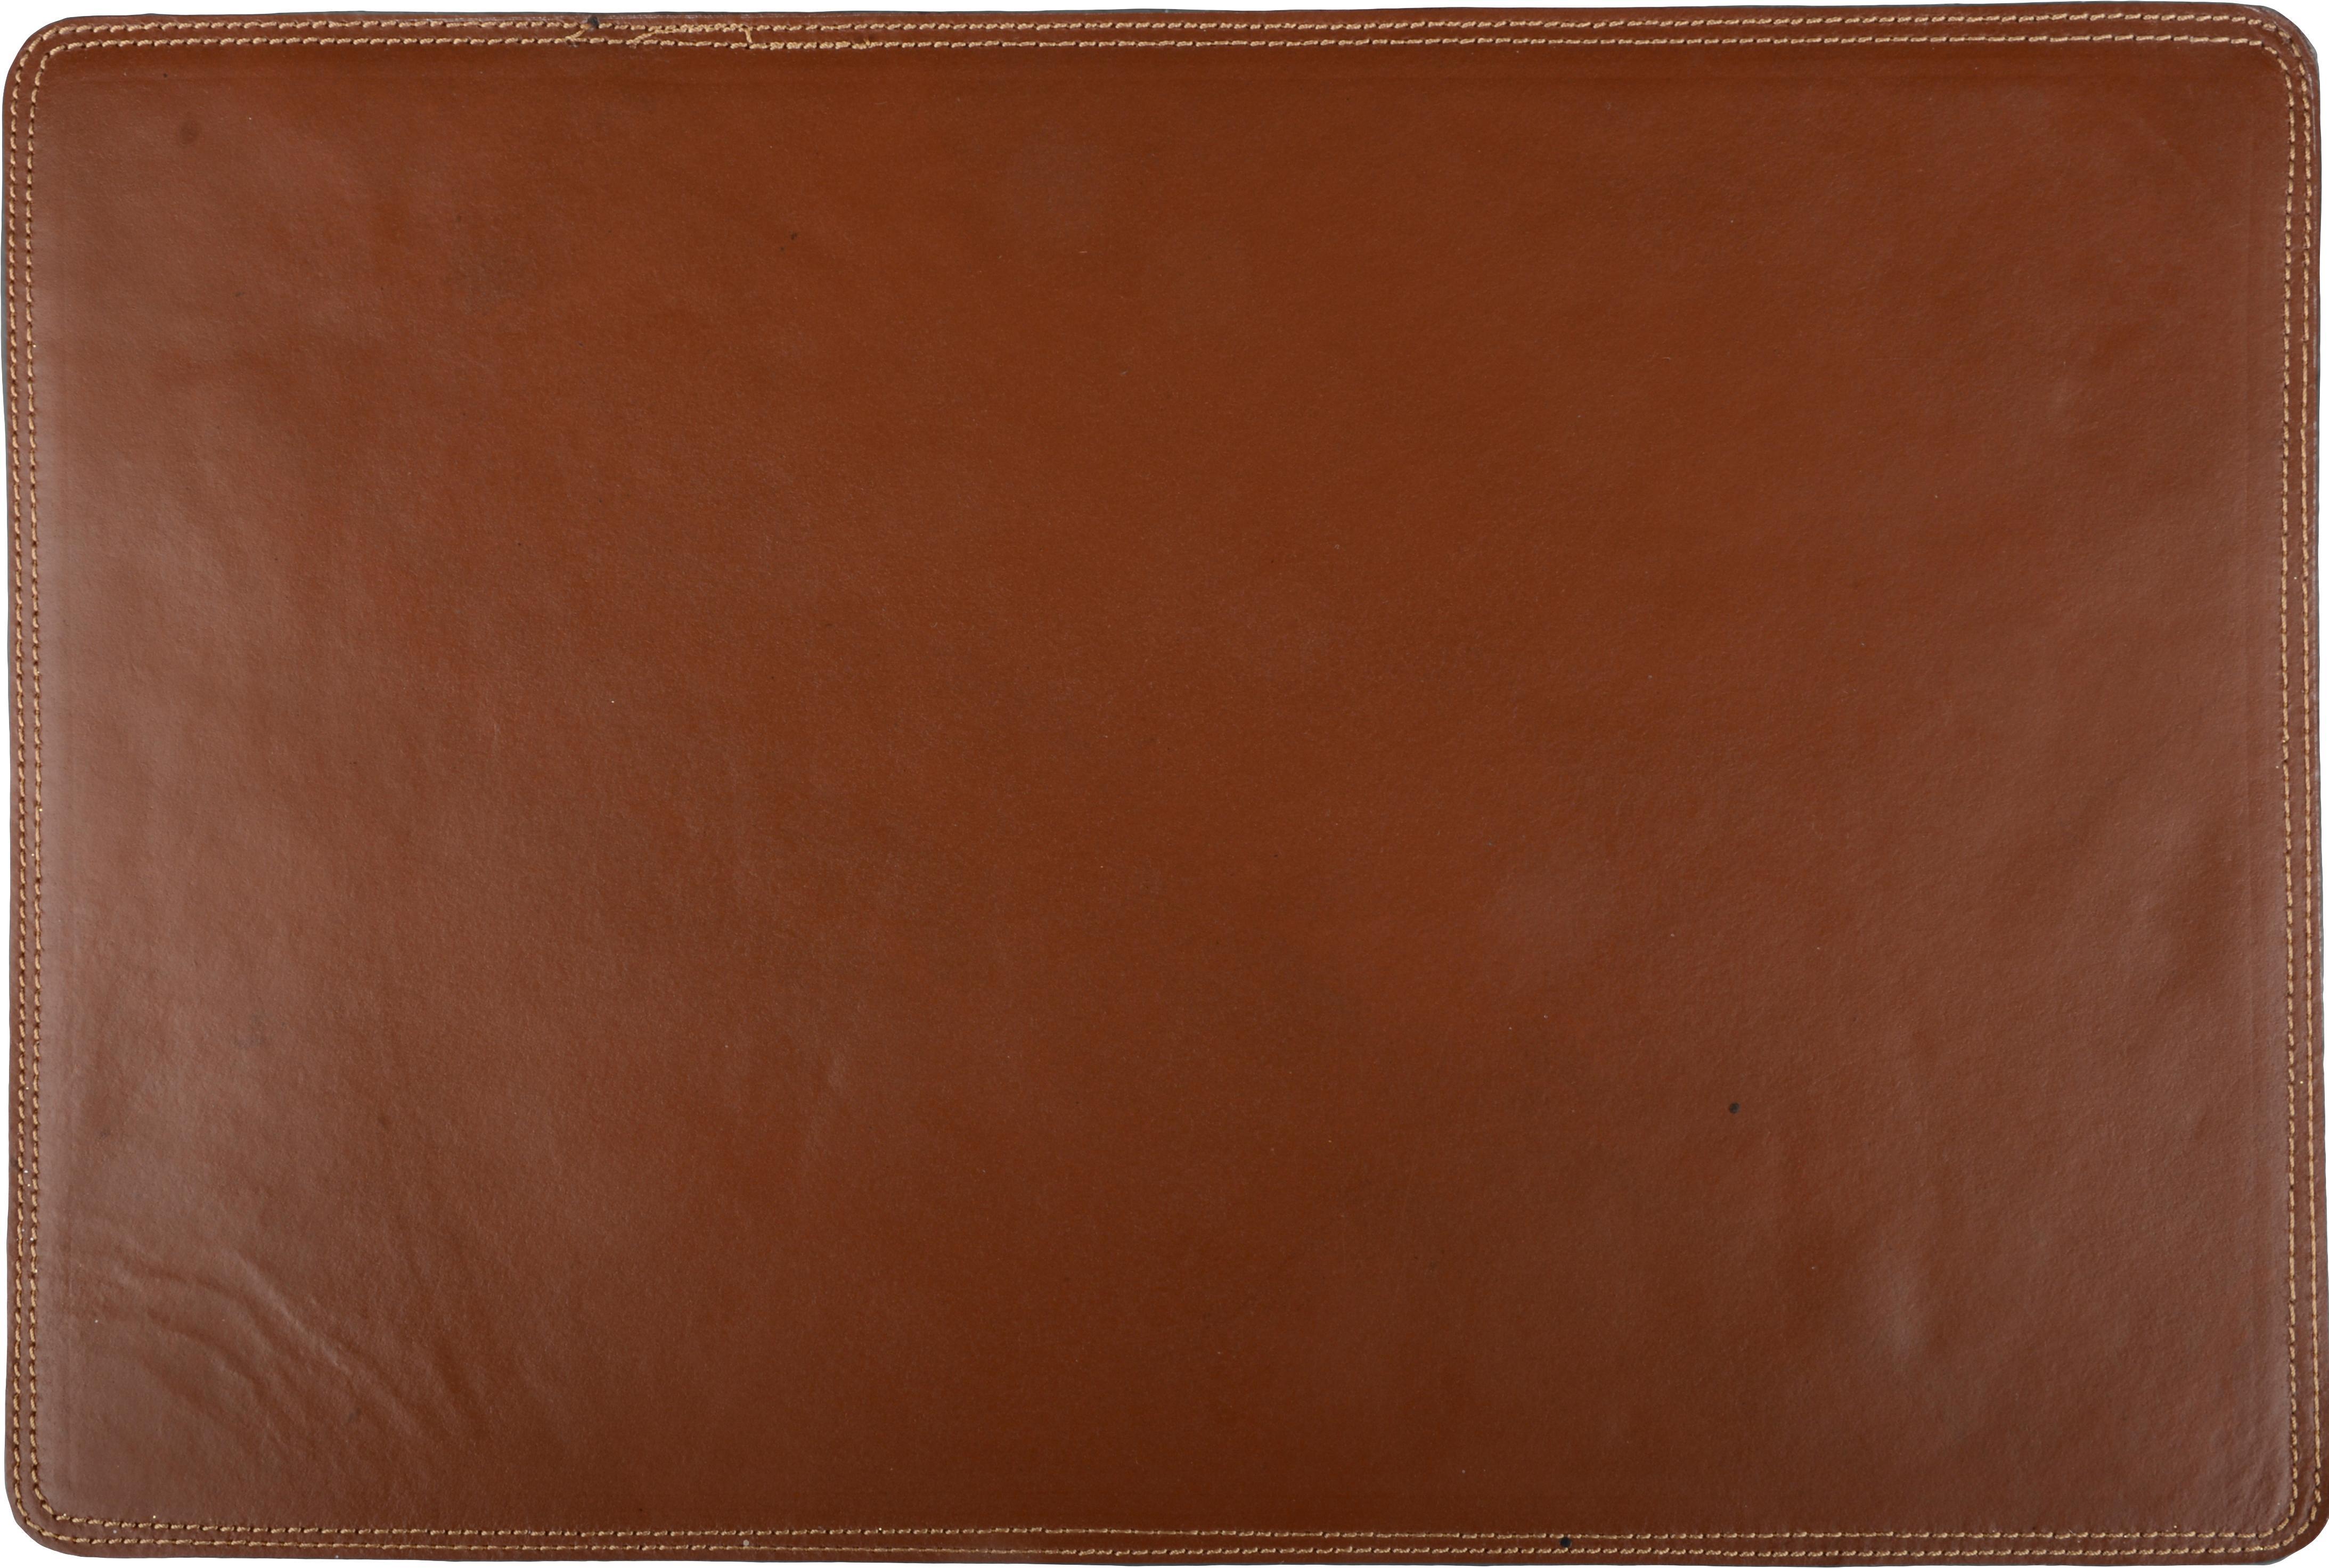 Kunstleder-Tischset Bina, Kunstleder, Cognac, 30 x 45 cm